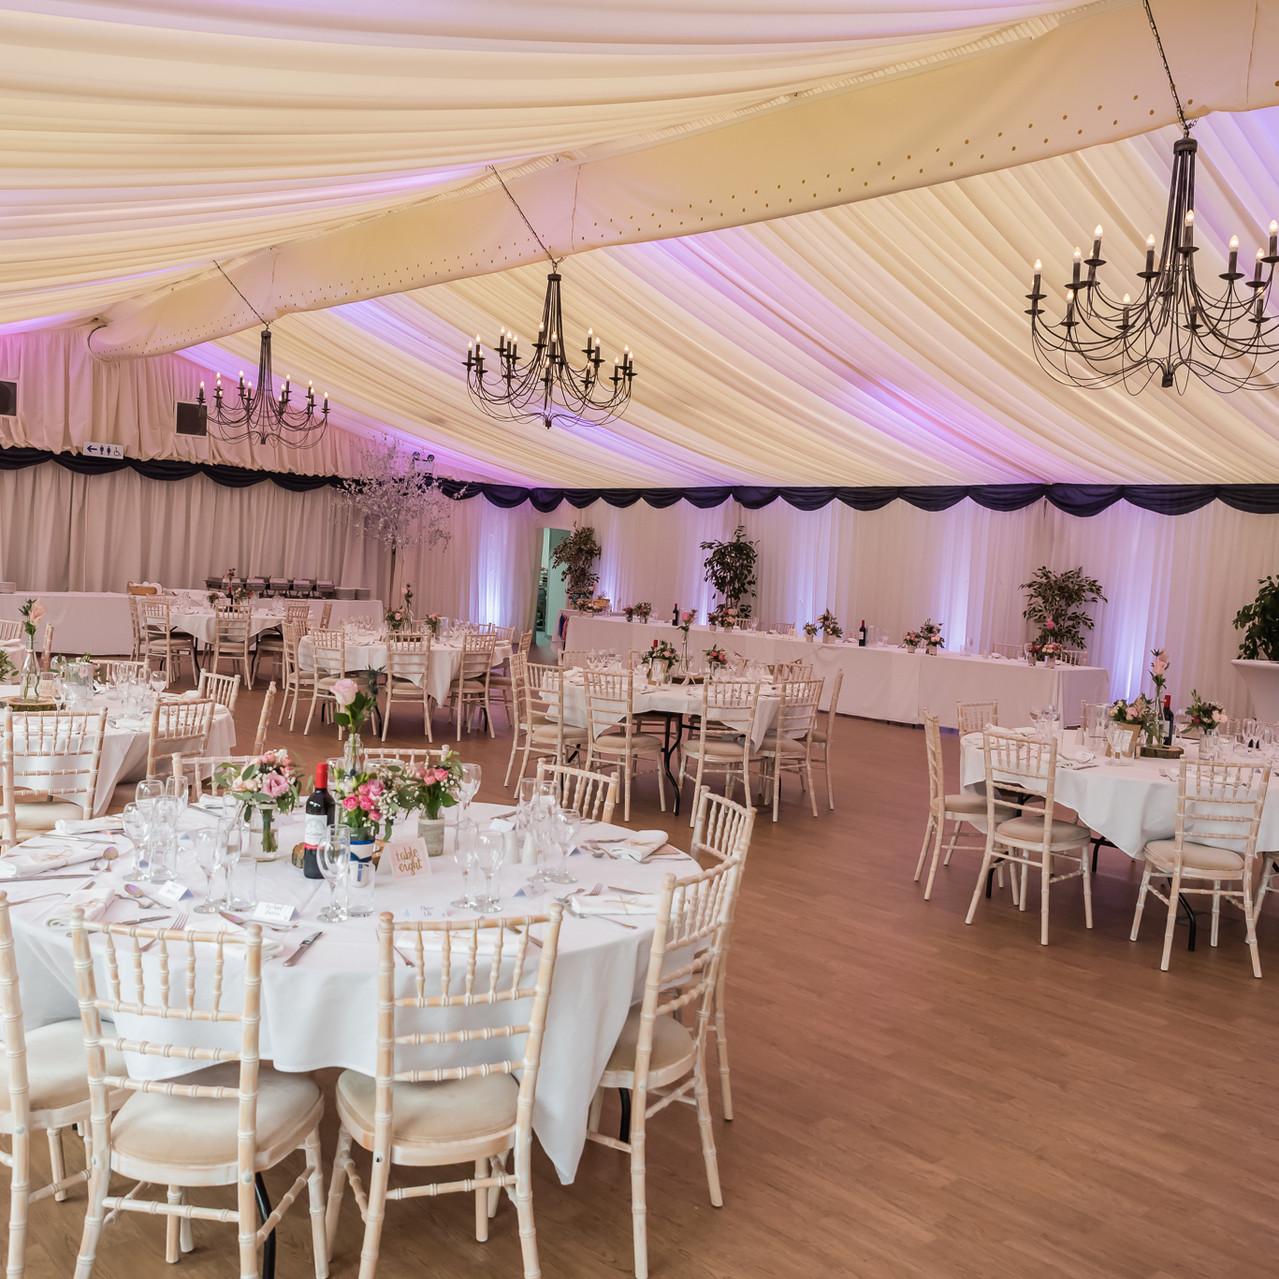 Fay Wedding - Thursford Collection at the Garden Pavilion, Norfolk. Reception